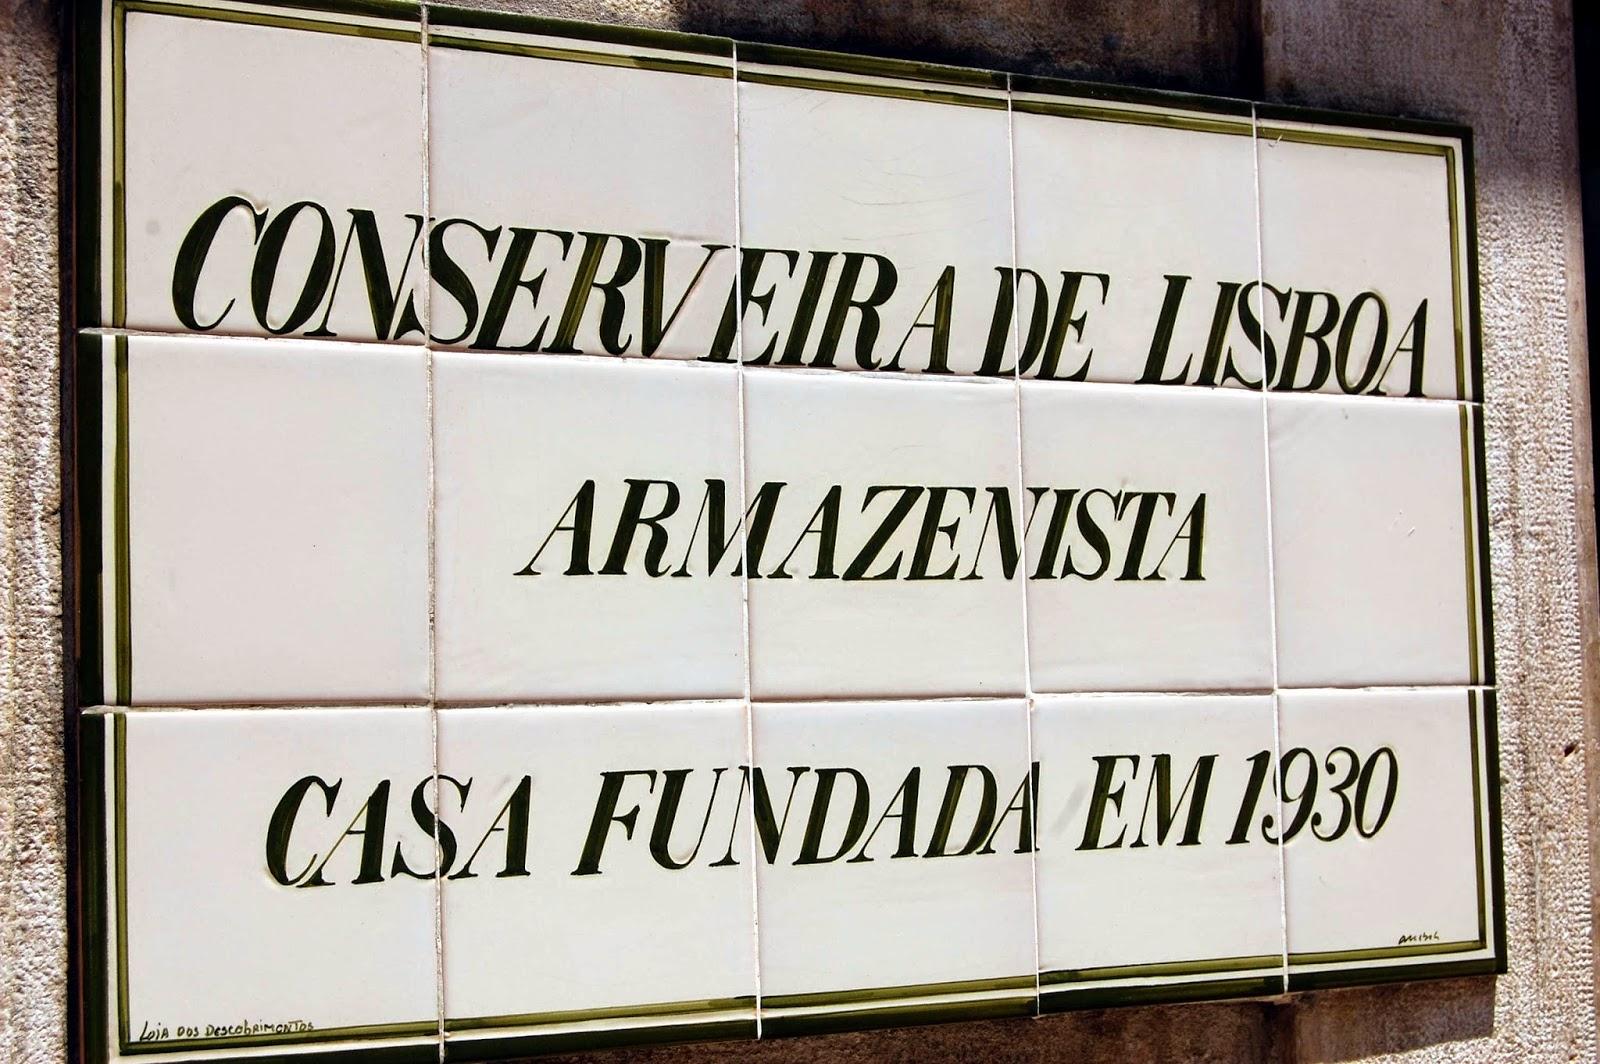 Stitch & Bear - Eat Drink Walk Petiscos Lisbon - Conserveira de Lisboa